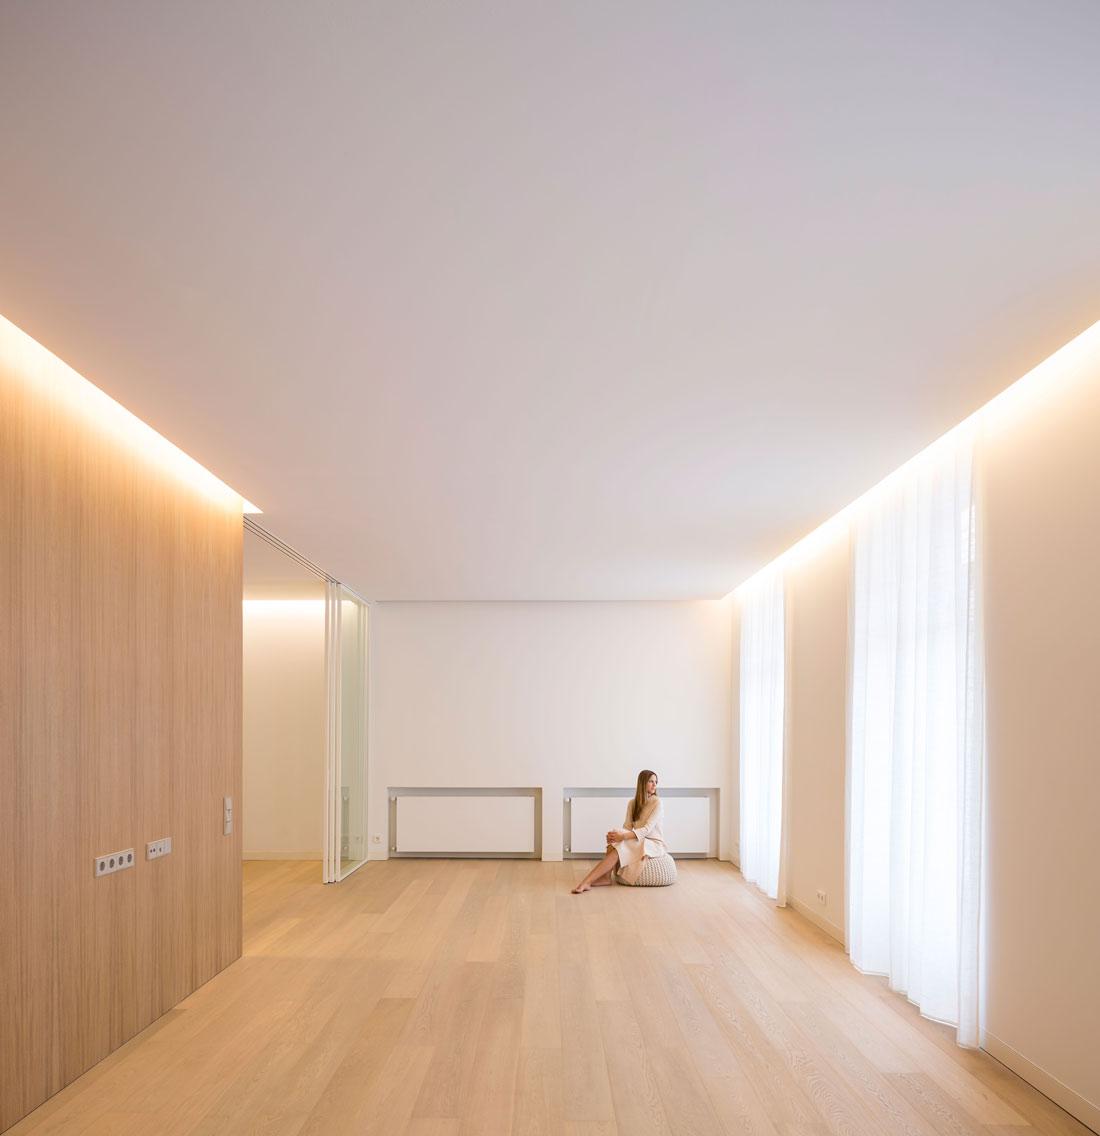 mayordomo architecture homu spanish architects nordic living room